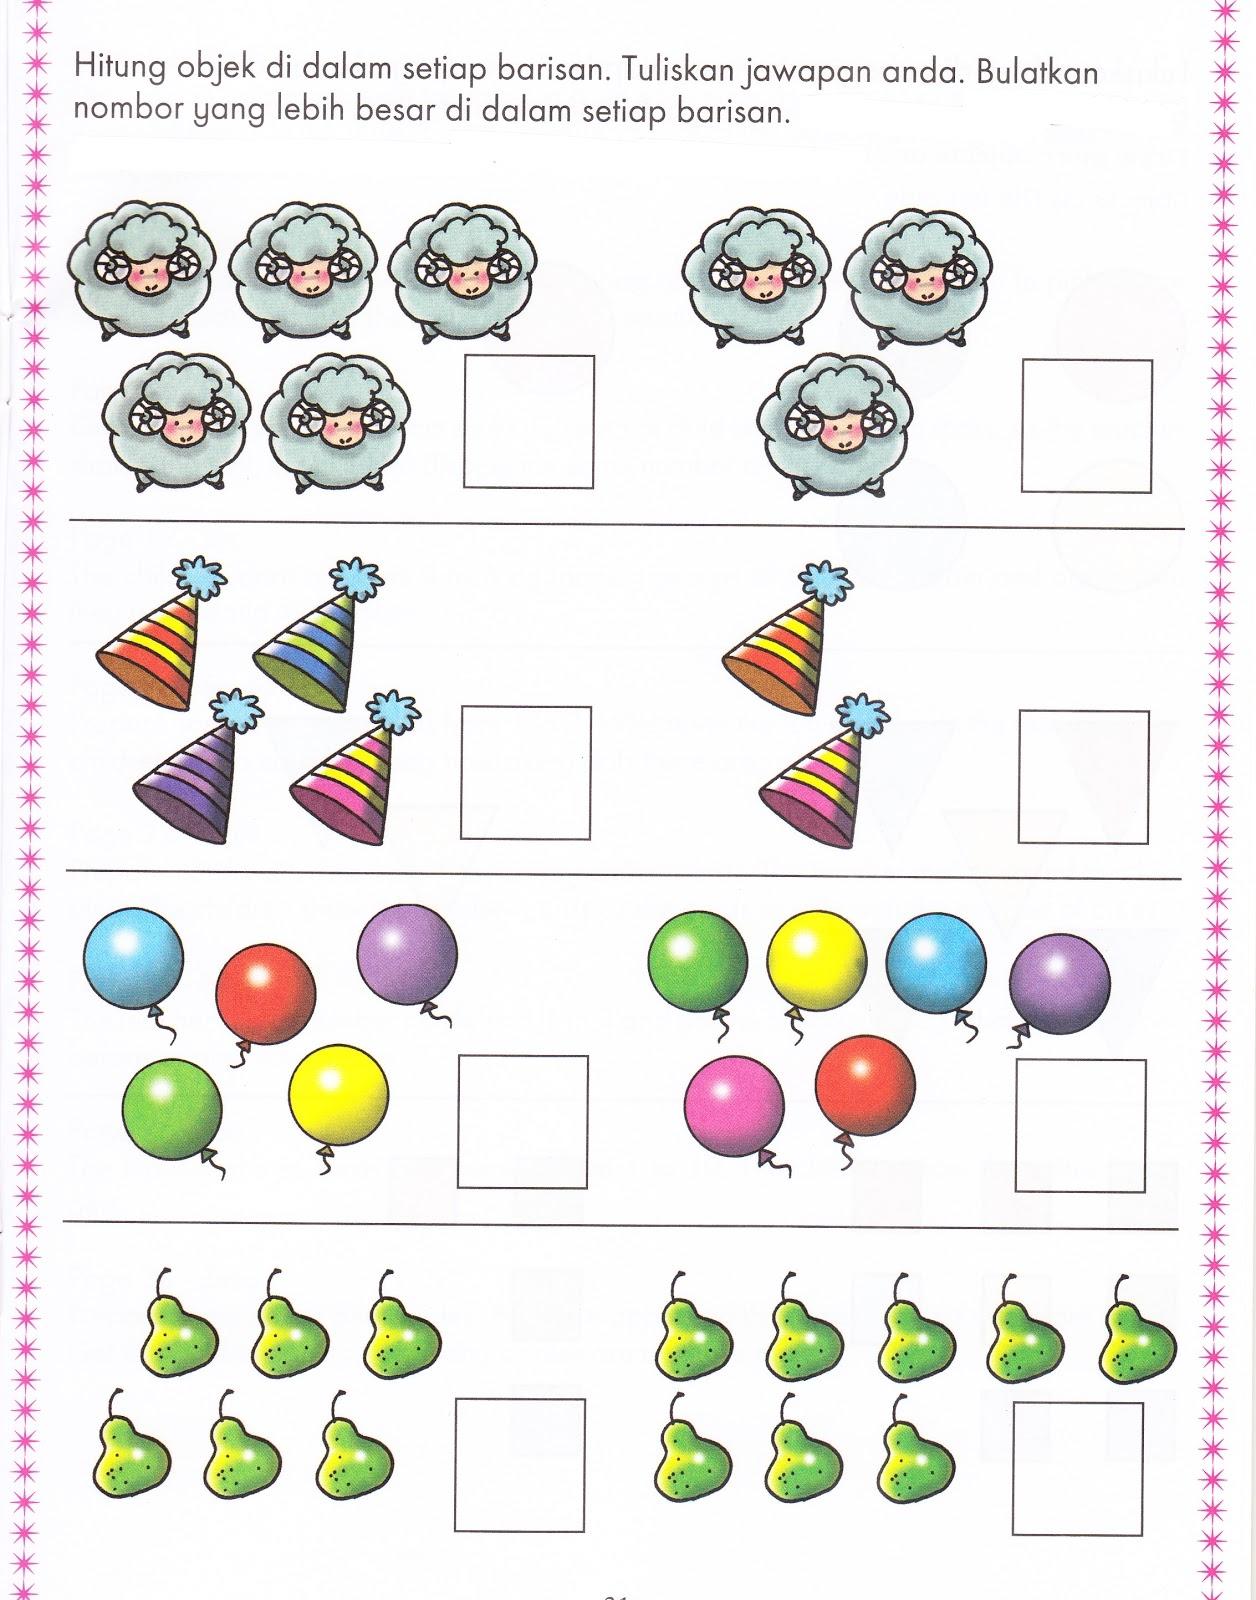 di sini saya ingin berkongsi sedikit lembaran kerja yang telah saya cari dari modul pengajaran dan pembelajaran matematik kssr tahun 1